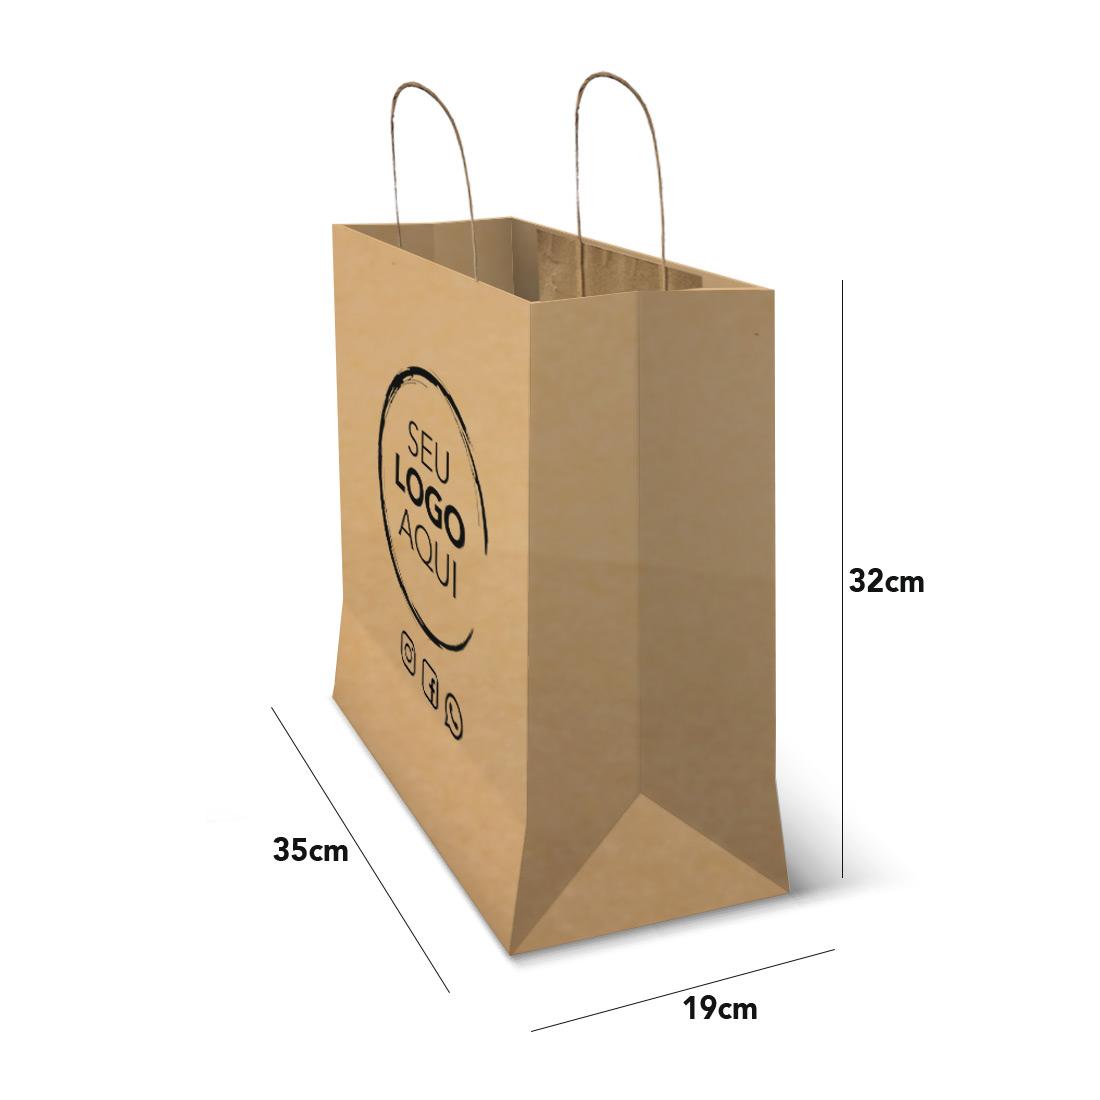 Sacola Kraft Personalizada Tamanho Delivery Plus (35 x 32 x 19)